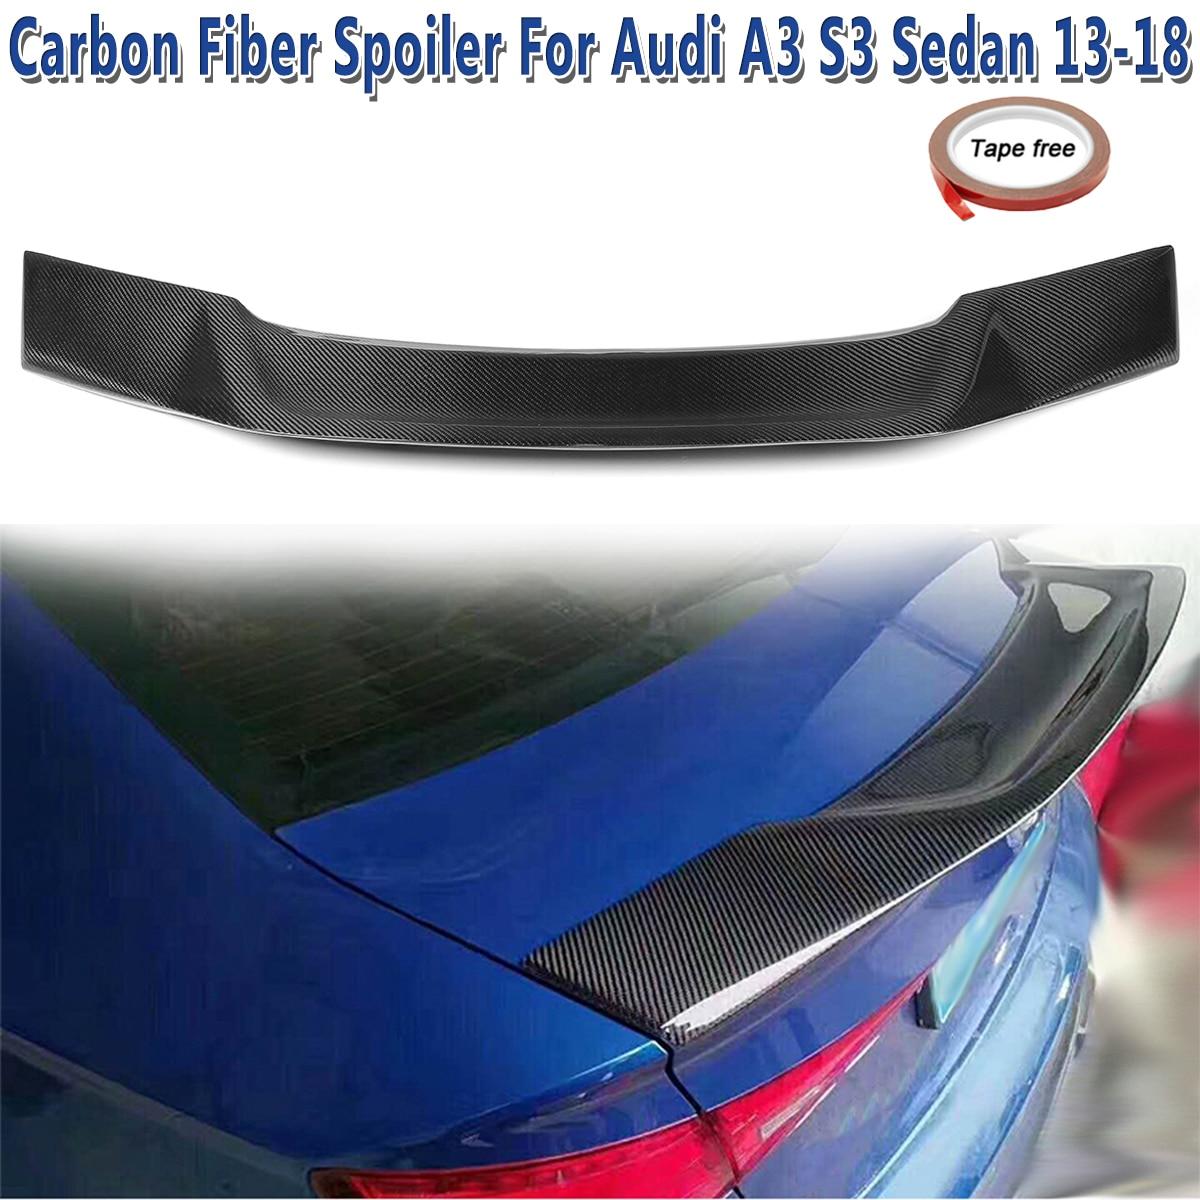 Real Carbon Fiber Rear Trunk Spoiler Lip for Audi A3 S3 Sedan 4-Door Type E 2013-2018 Car Rear Wing Trunk Lip Spoilers bsg fv21811gtn 51 1995 nissan altima 4 door sedan rear driver vent green tint auto glass